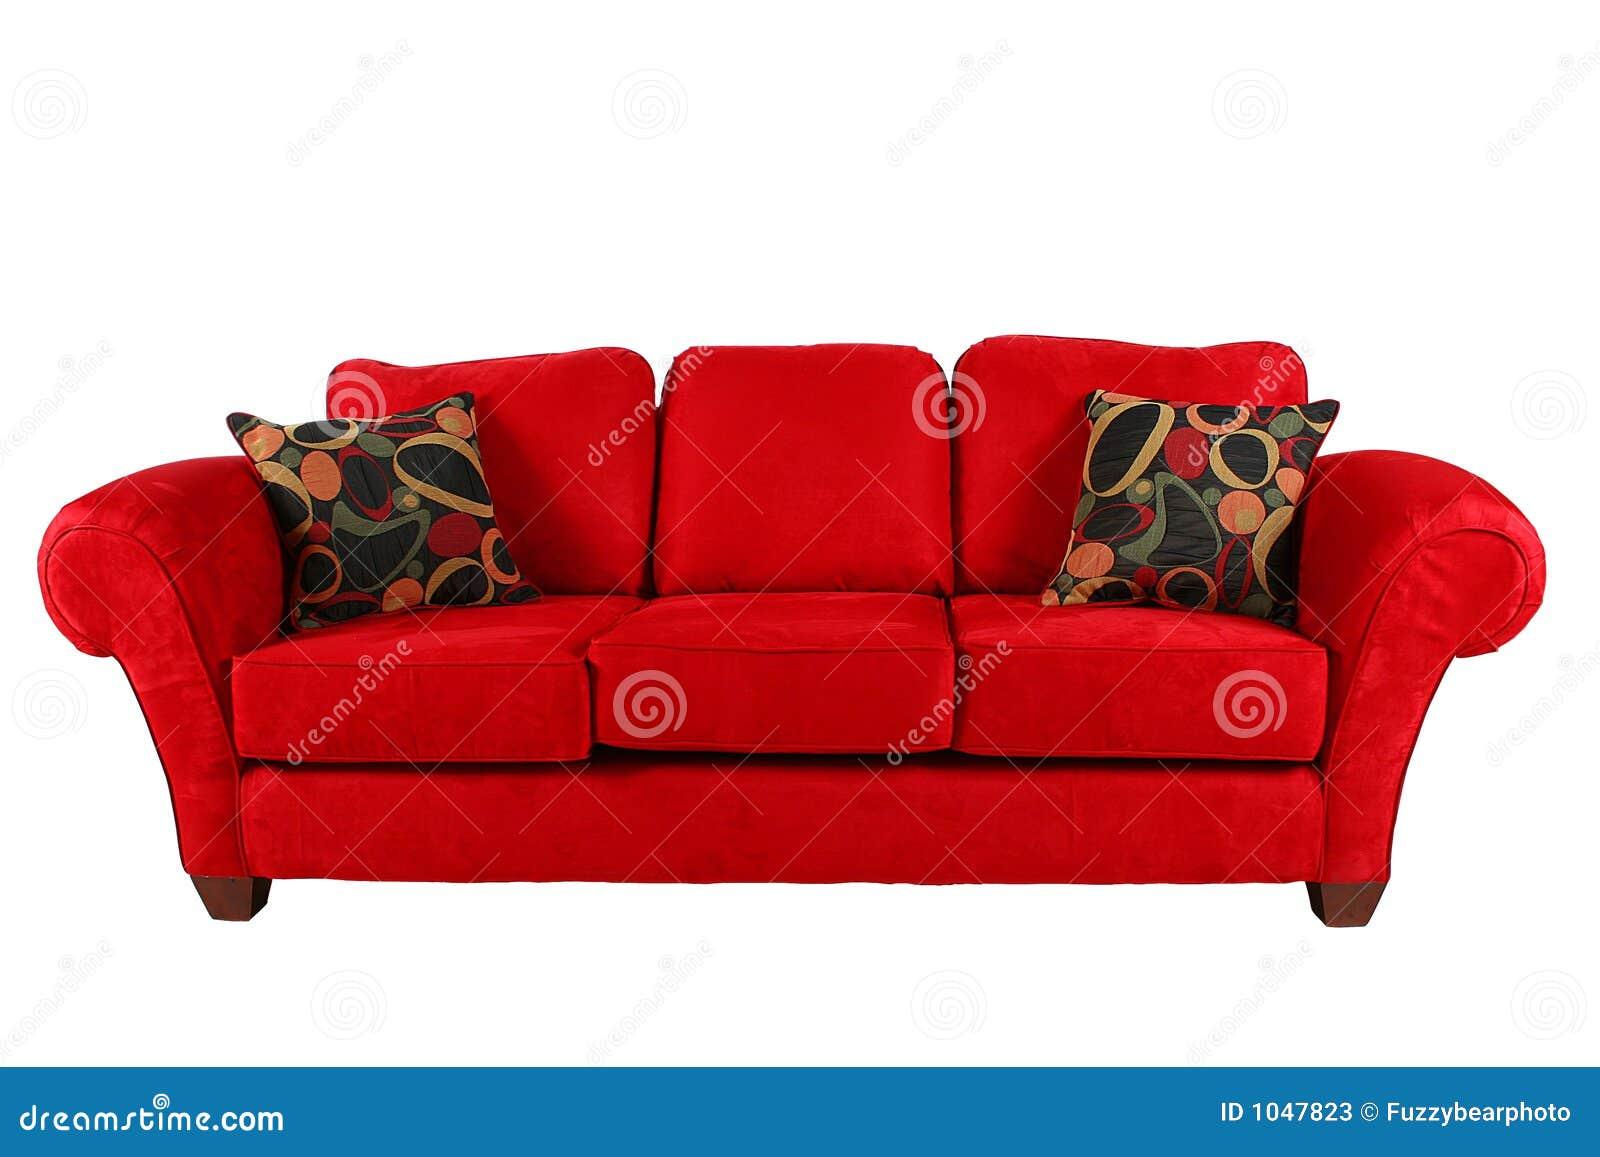 Red Sofa With Modern Pillows Stock Photos Image 1047823